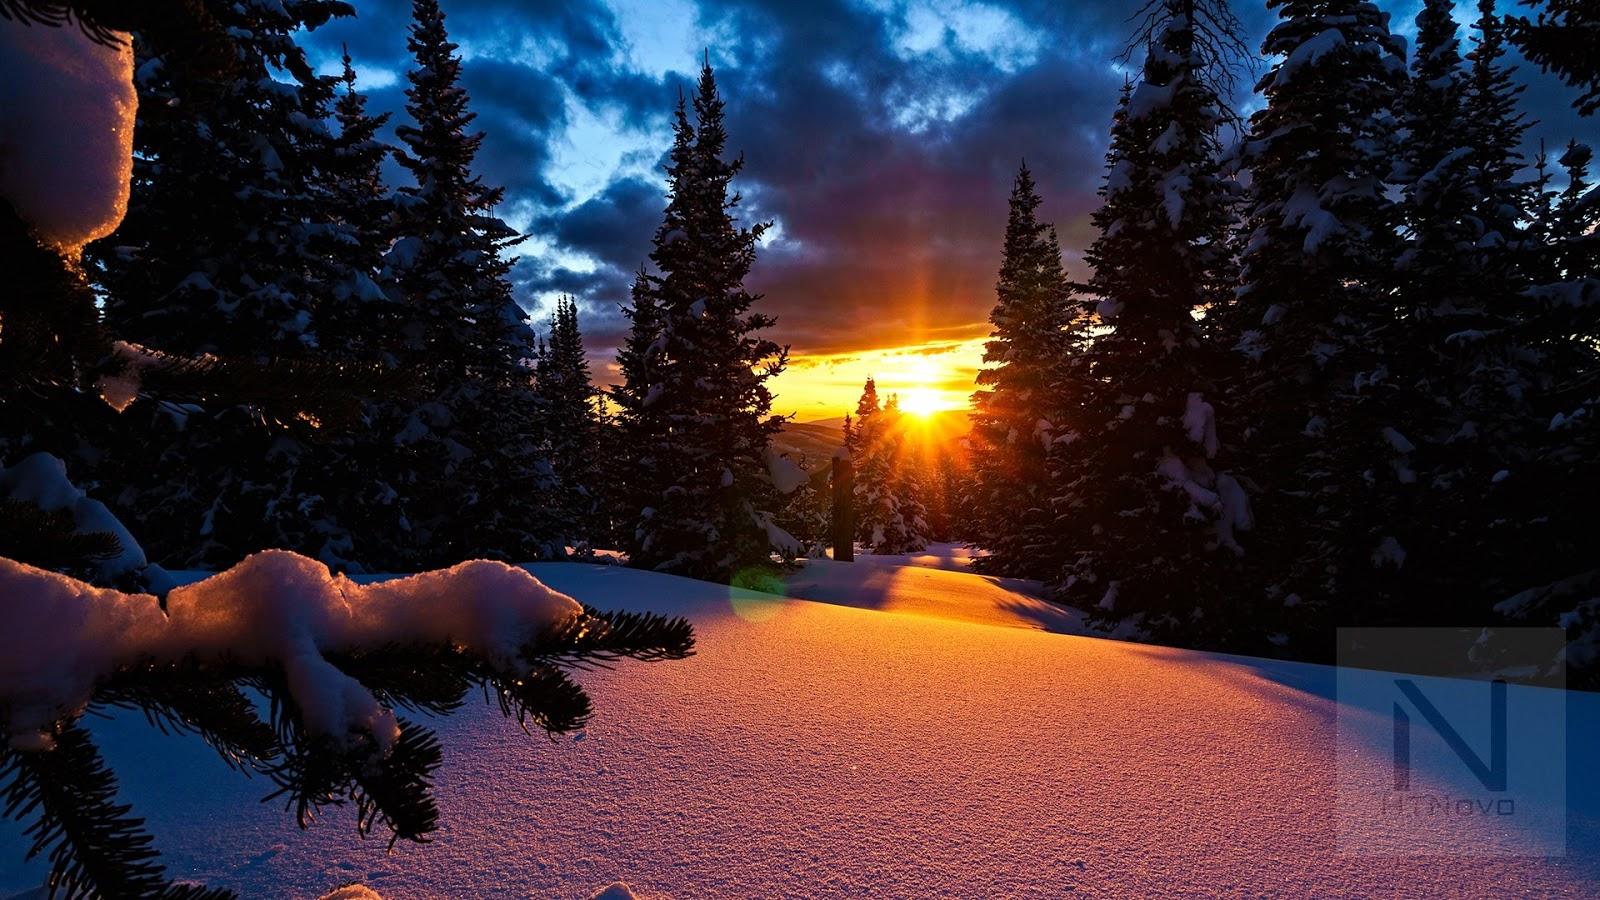 Snowy-Mountains-Frosty-Art-Temi-Windows-10